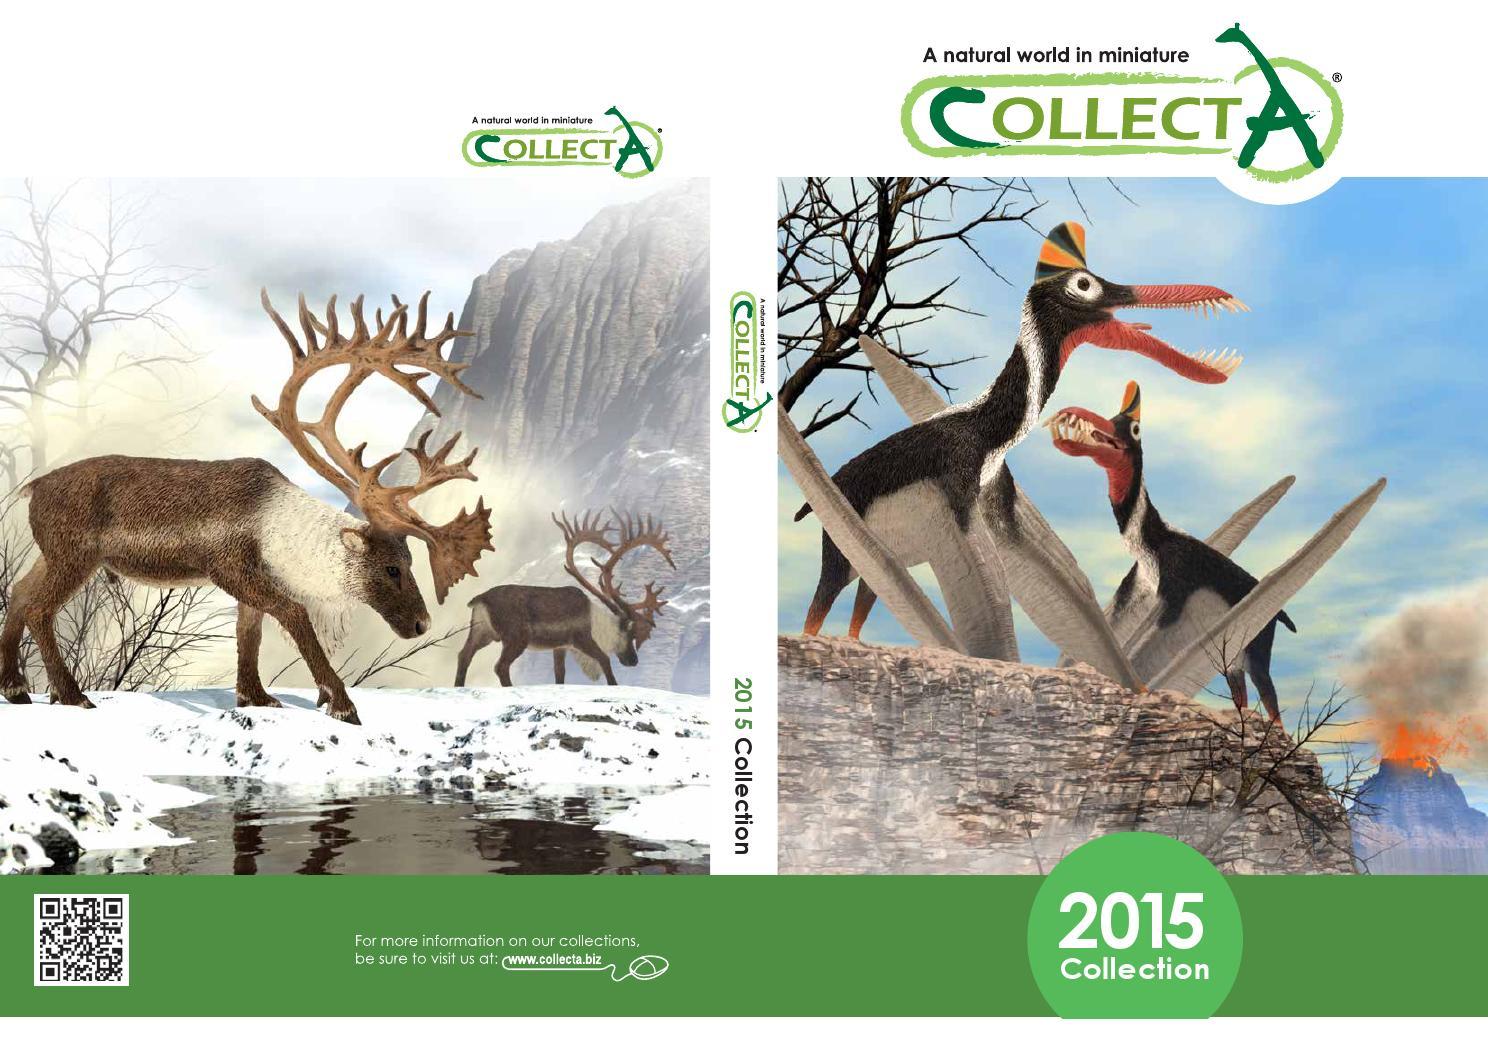 RABBIT CollectA # 88002 Woodland Farm Animal Collectible Toy Replica Rabbit NWT